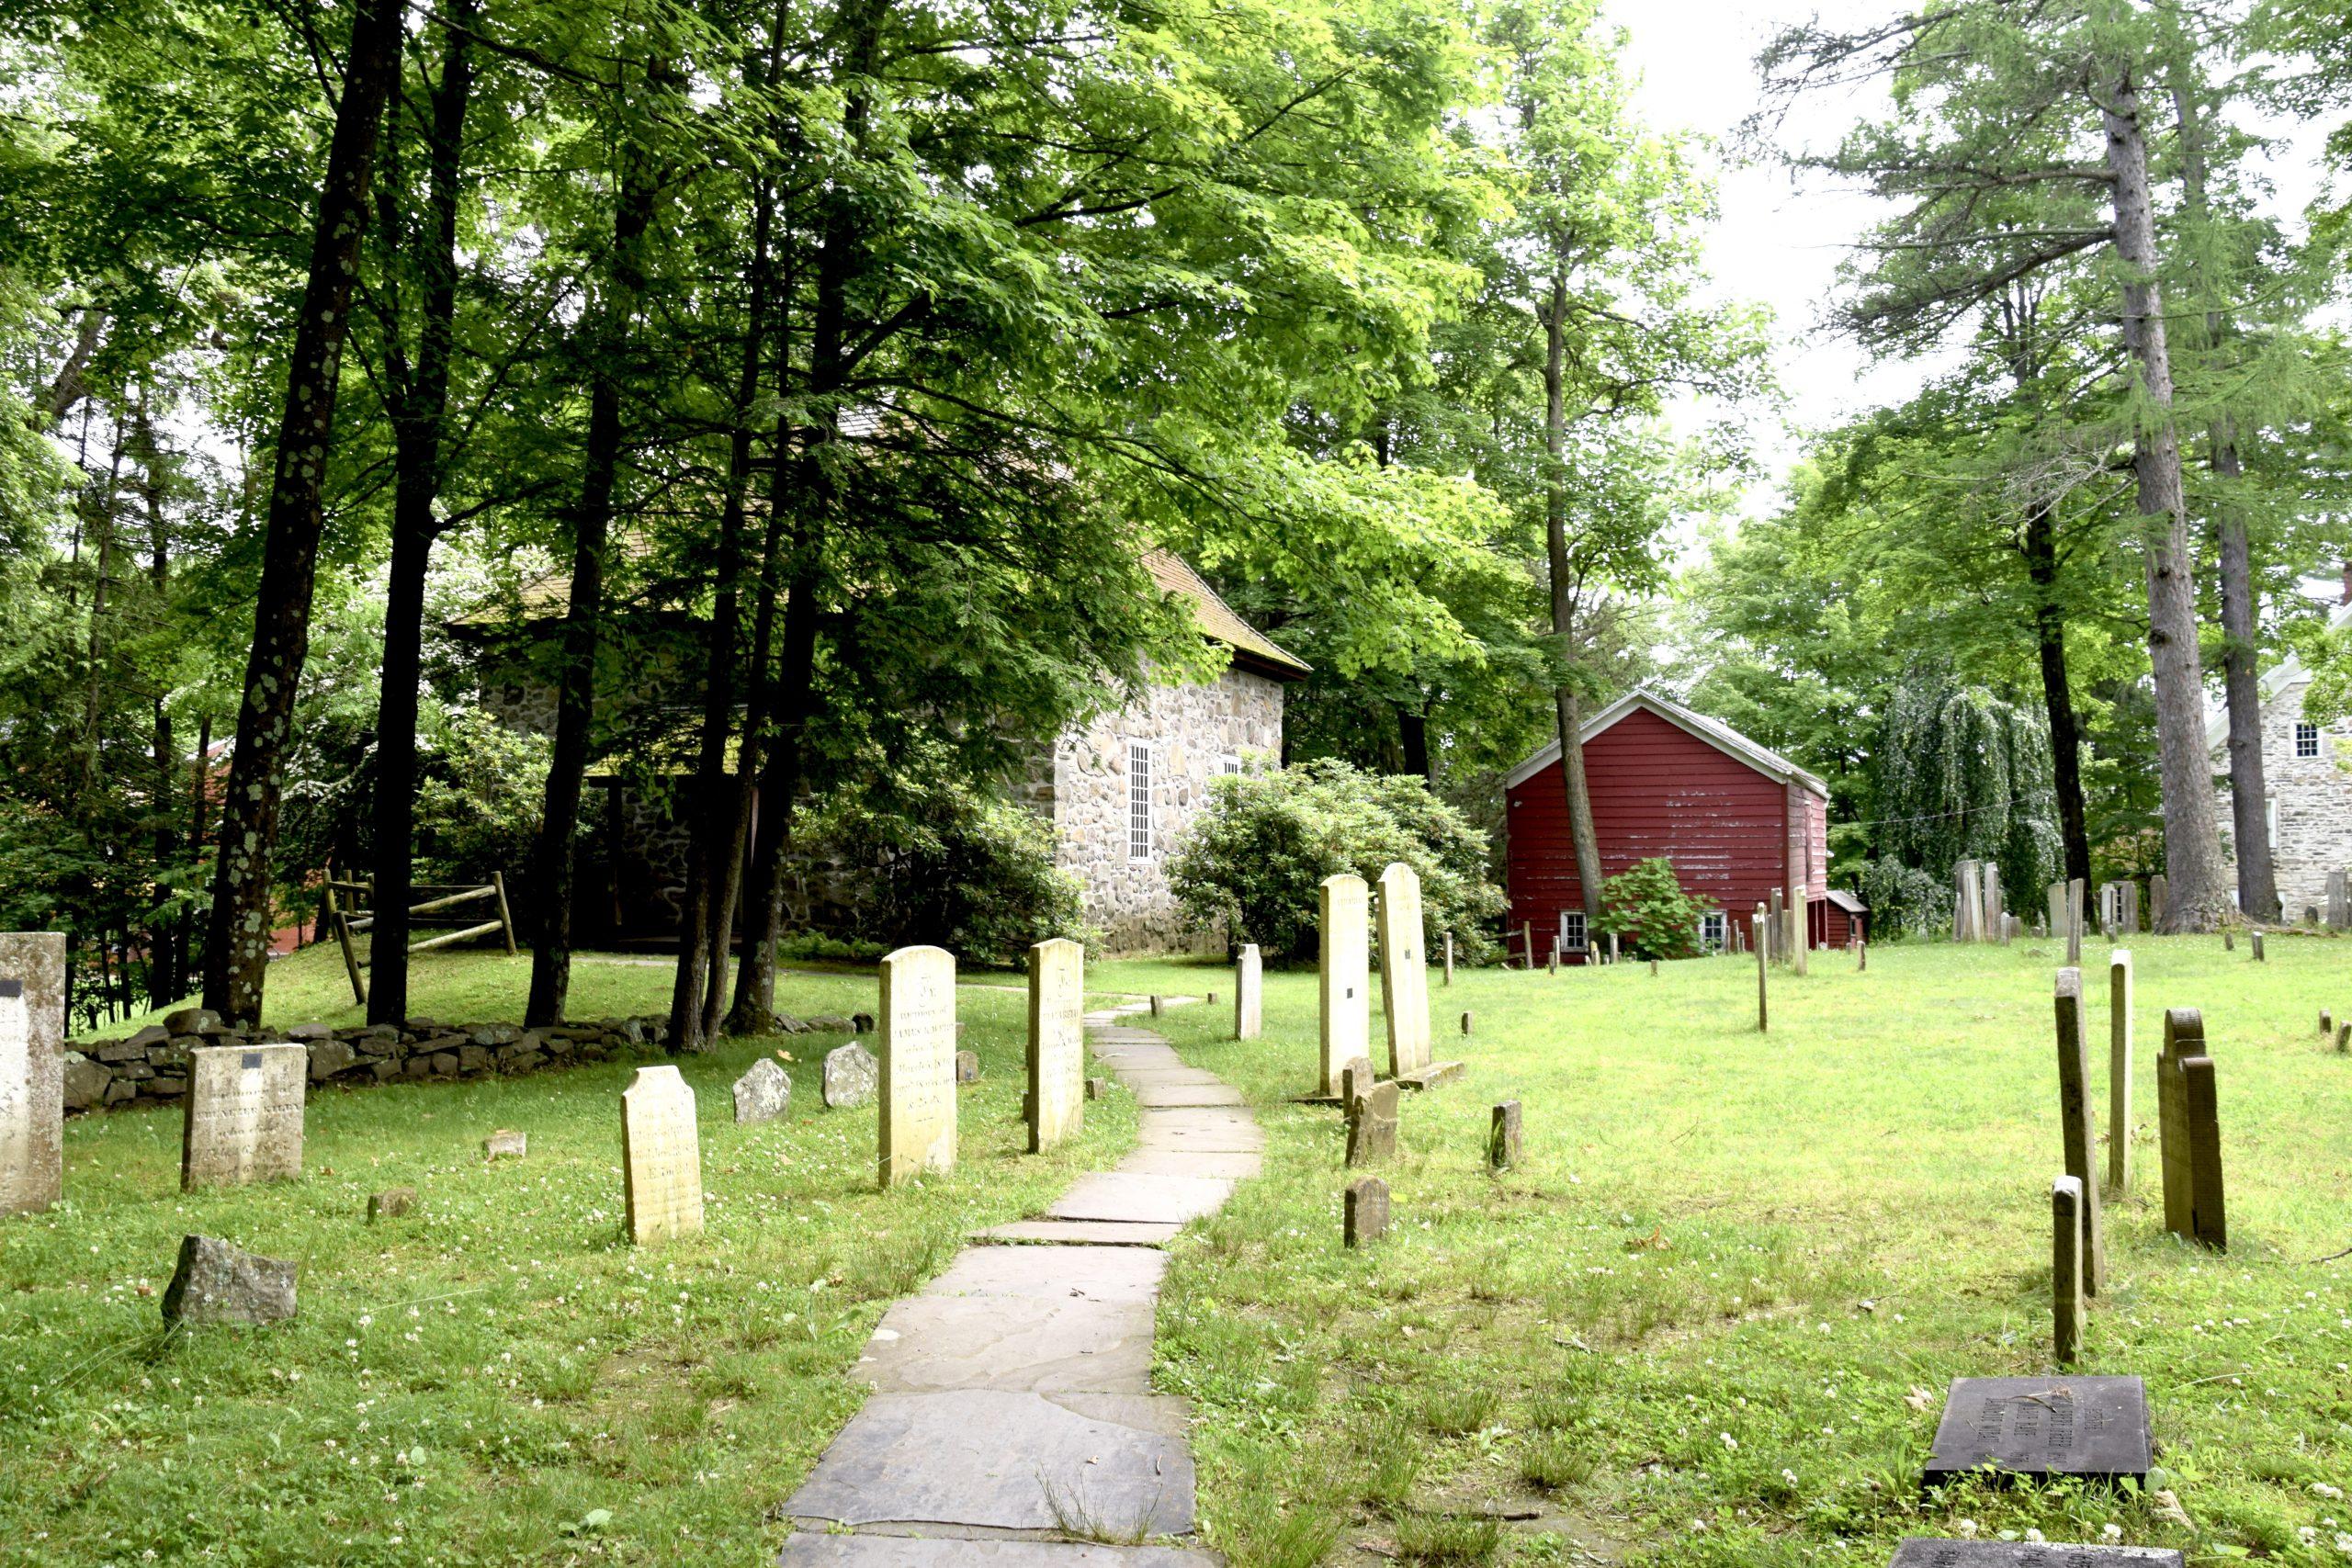 Graveyard at Historic Huguenot Street in New Paltz, New York